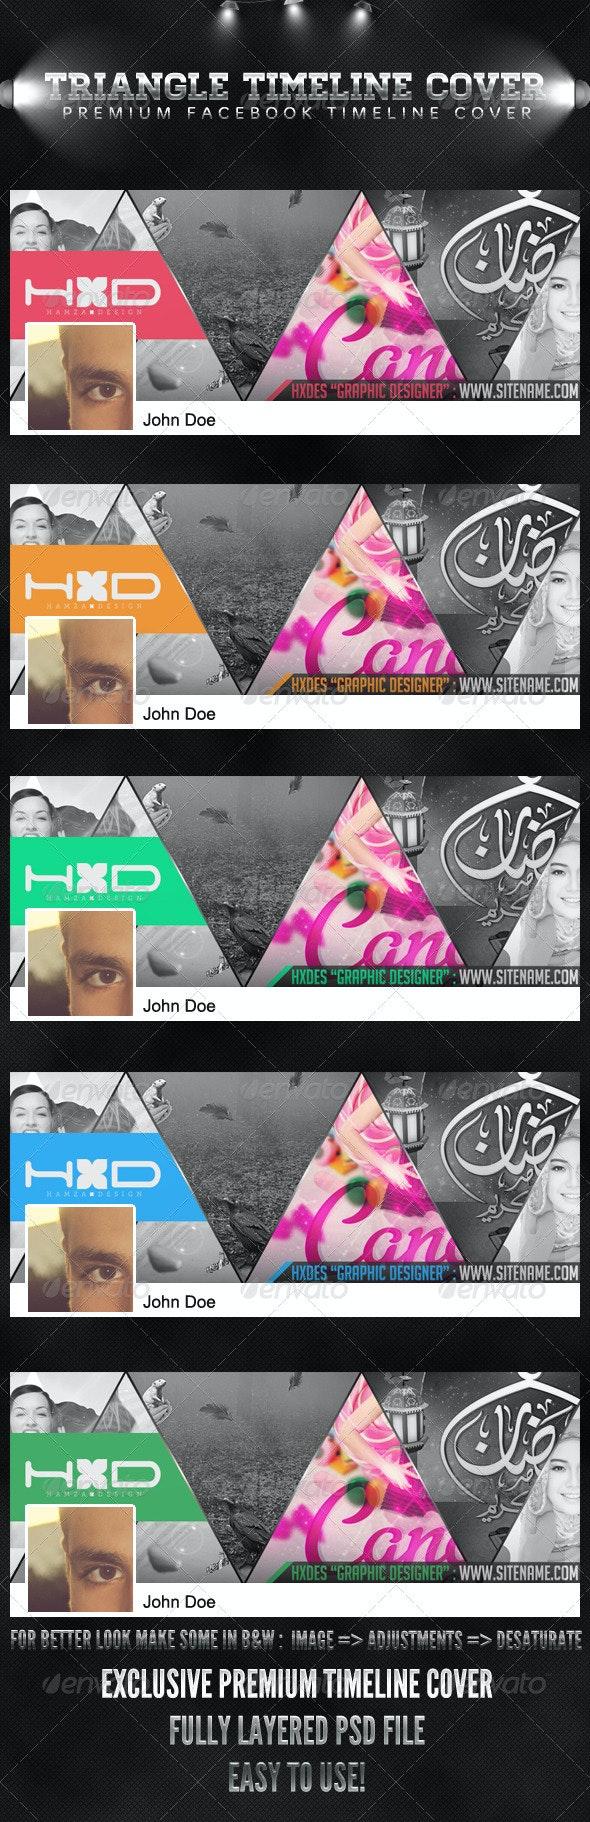 Triangle Timeline Cover - Facebook Timeline Covers Social Media